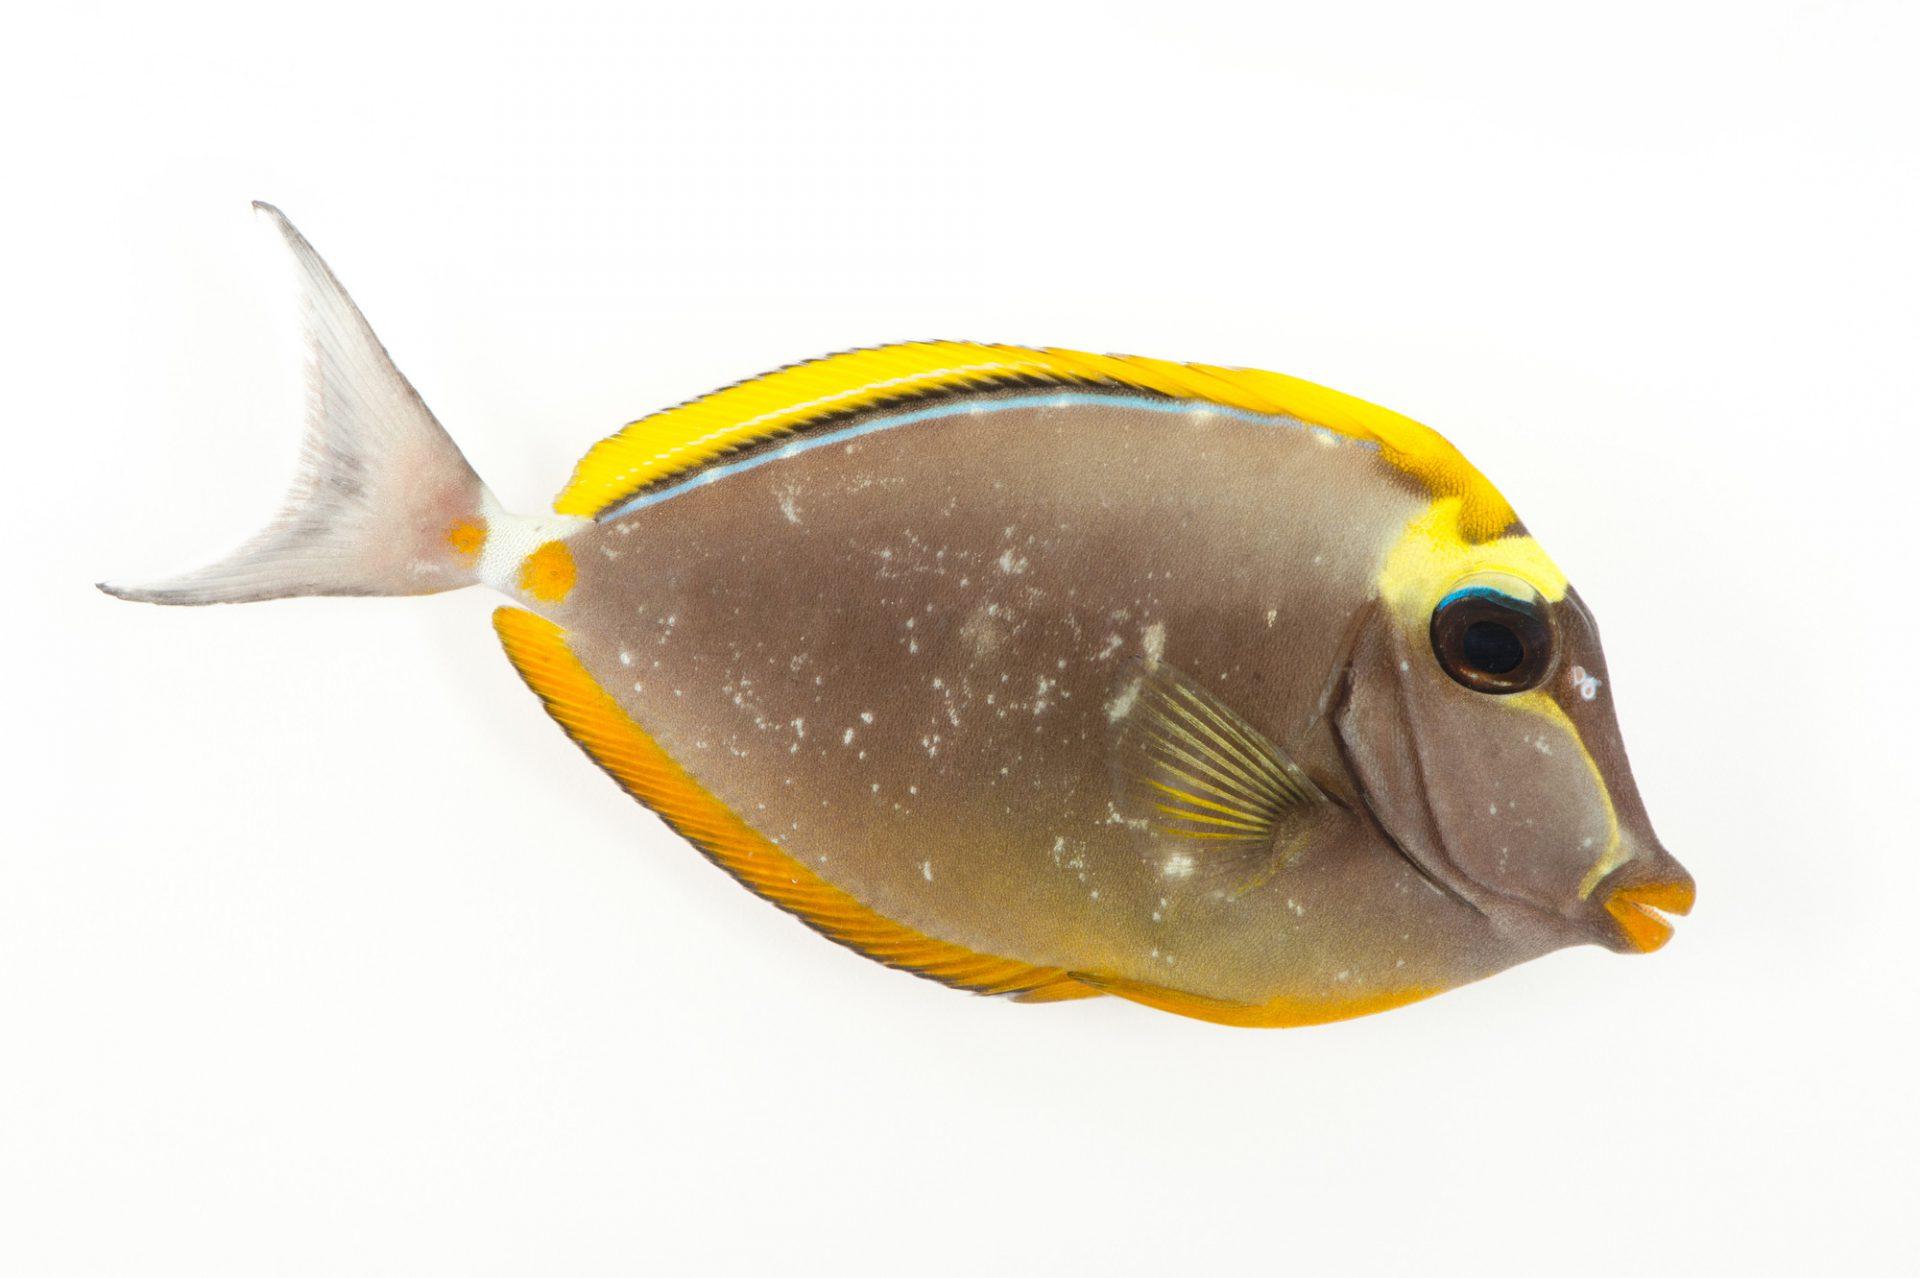 Picture of an orange spine surgeonfish (Naso lituratus) at Pure Aquariums from the Gulf Specimen Marine Lab.